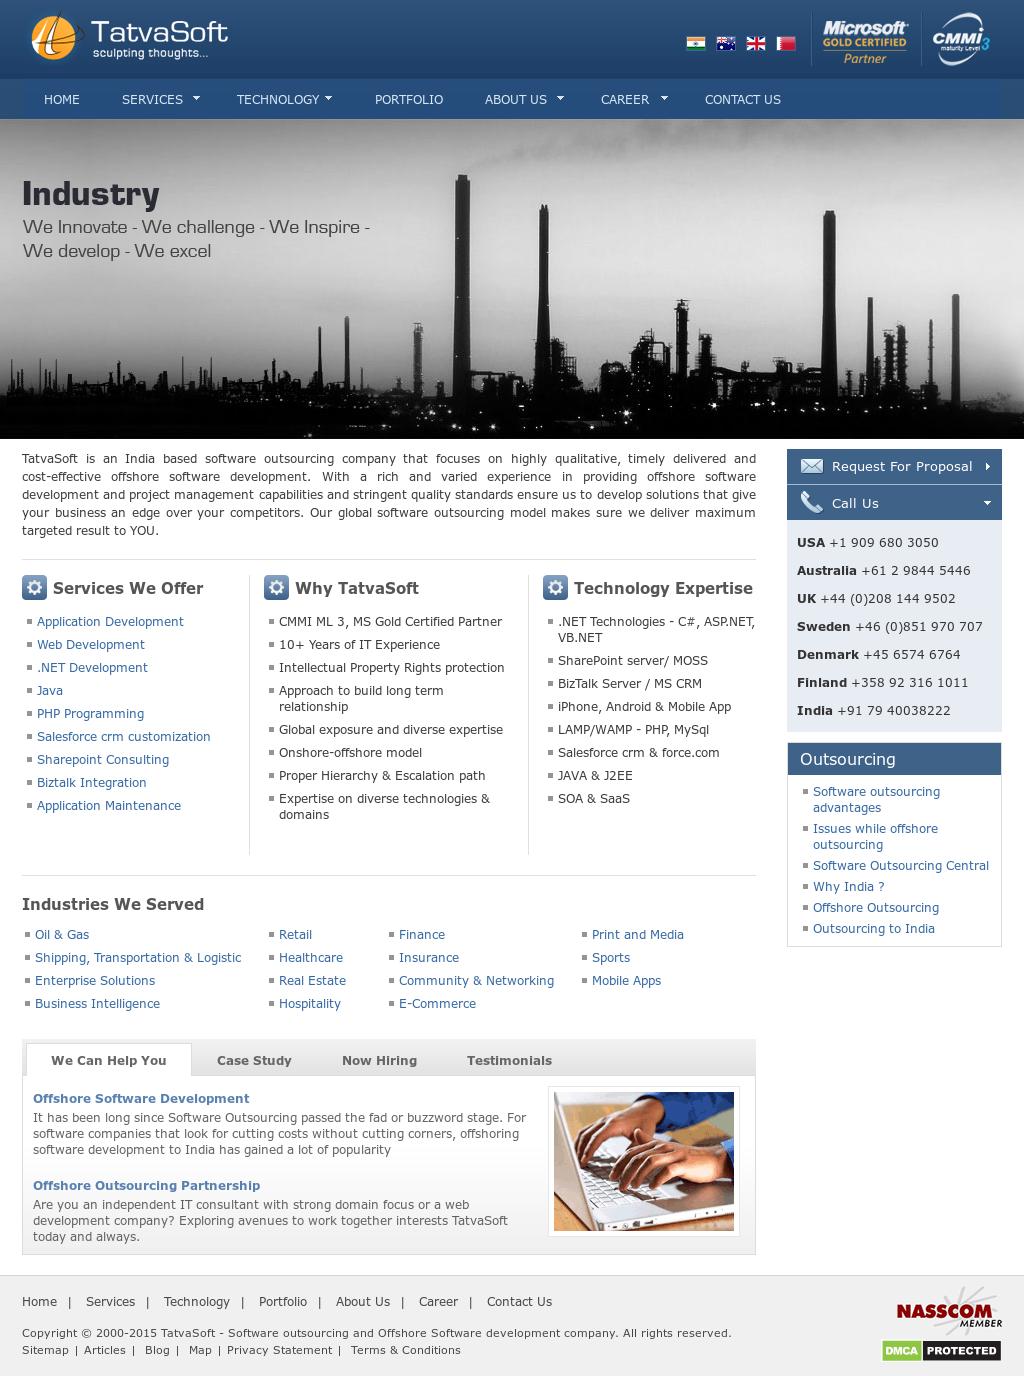 TatvaSoft Competitors, Revenue and Employees - Owler Company